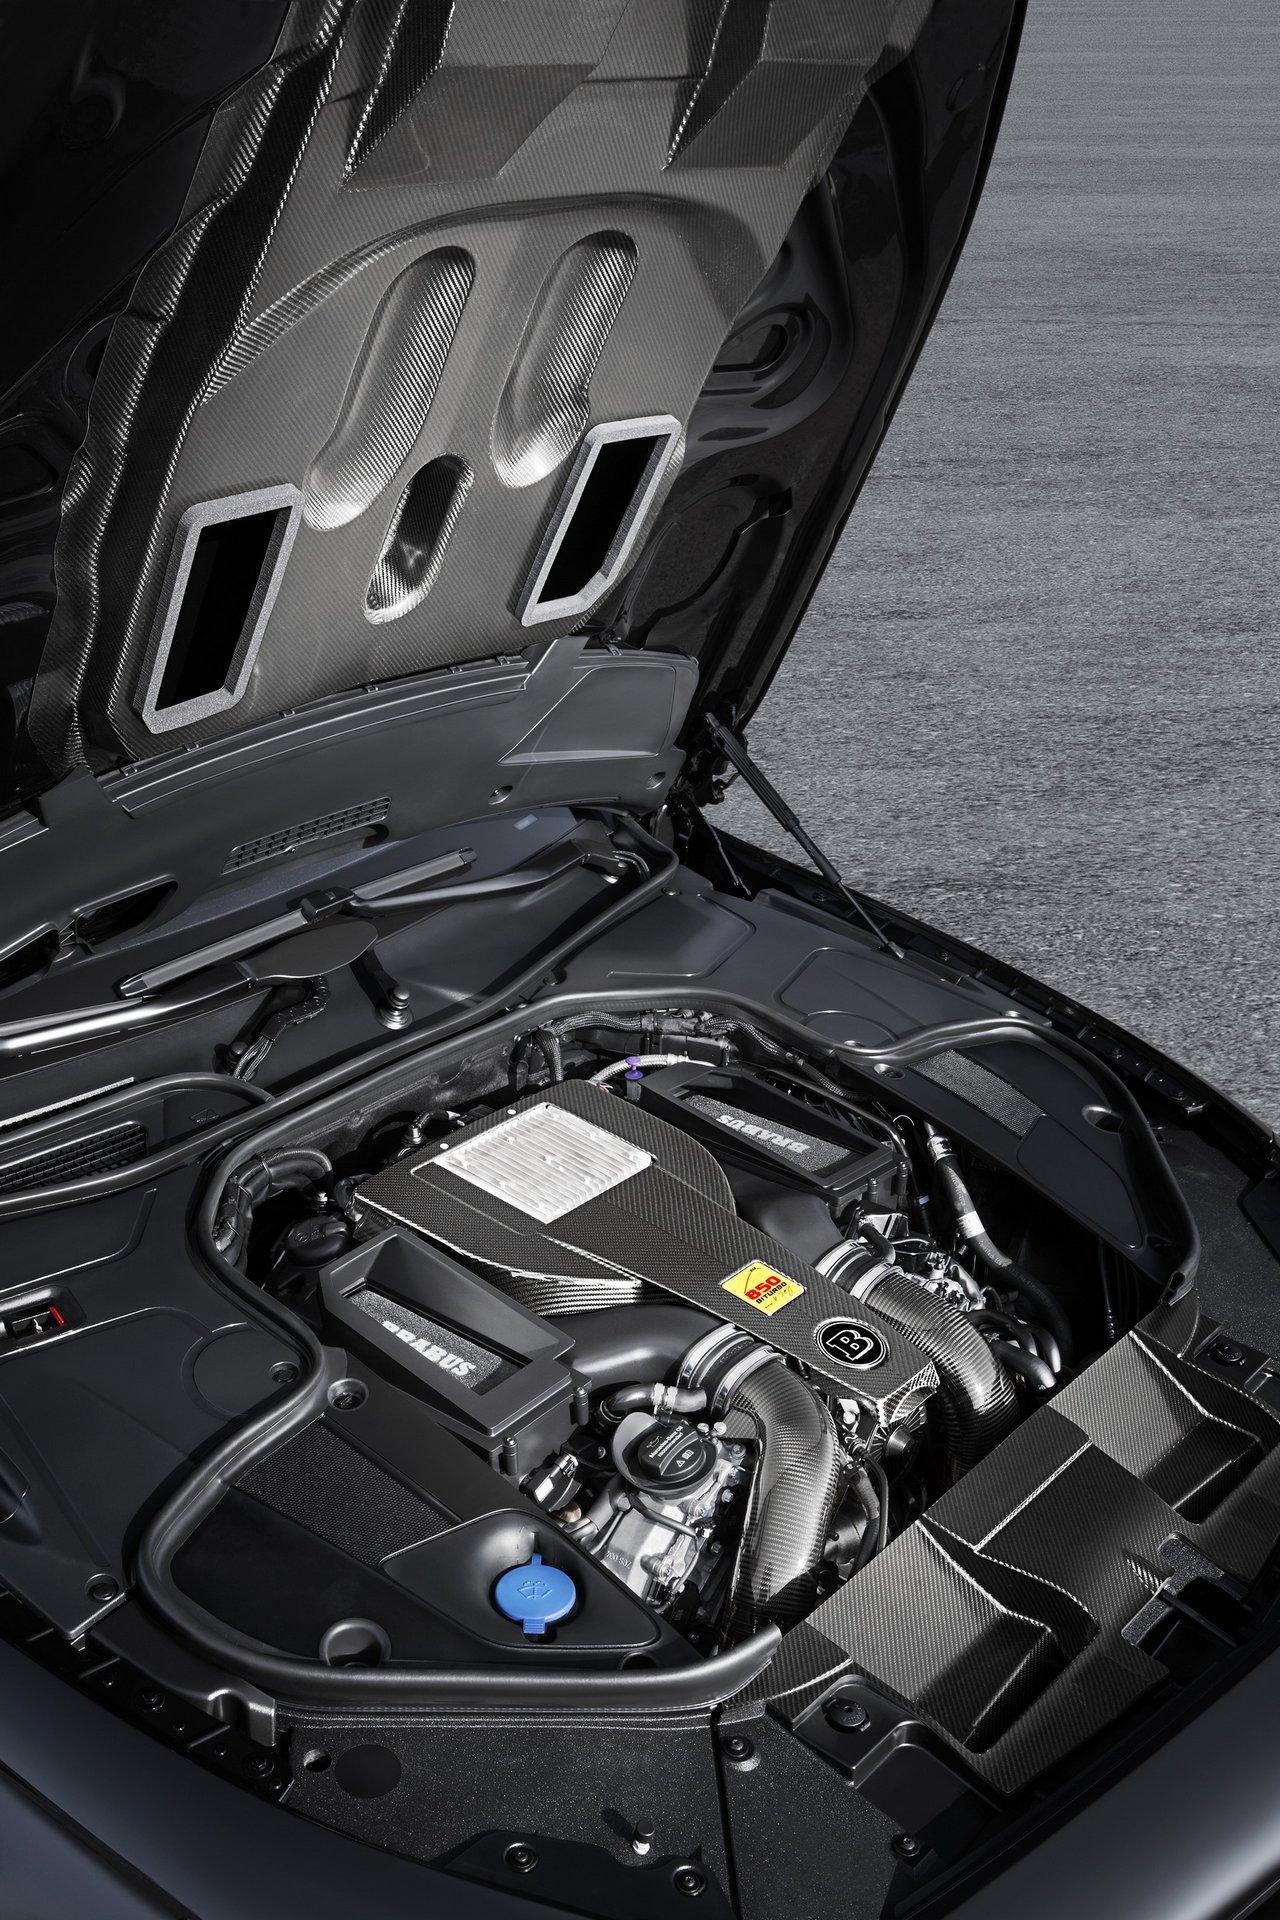 ginevra_2015-brabus-850-sc-e-mercedes-s63-amg-coupe-0-100_21